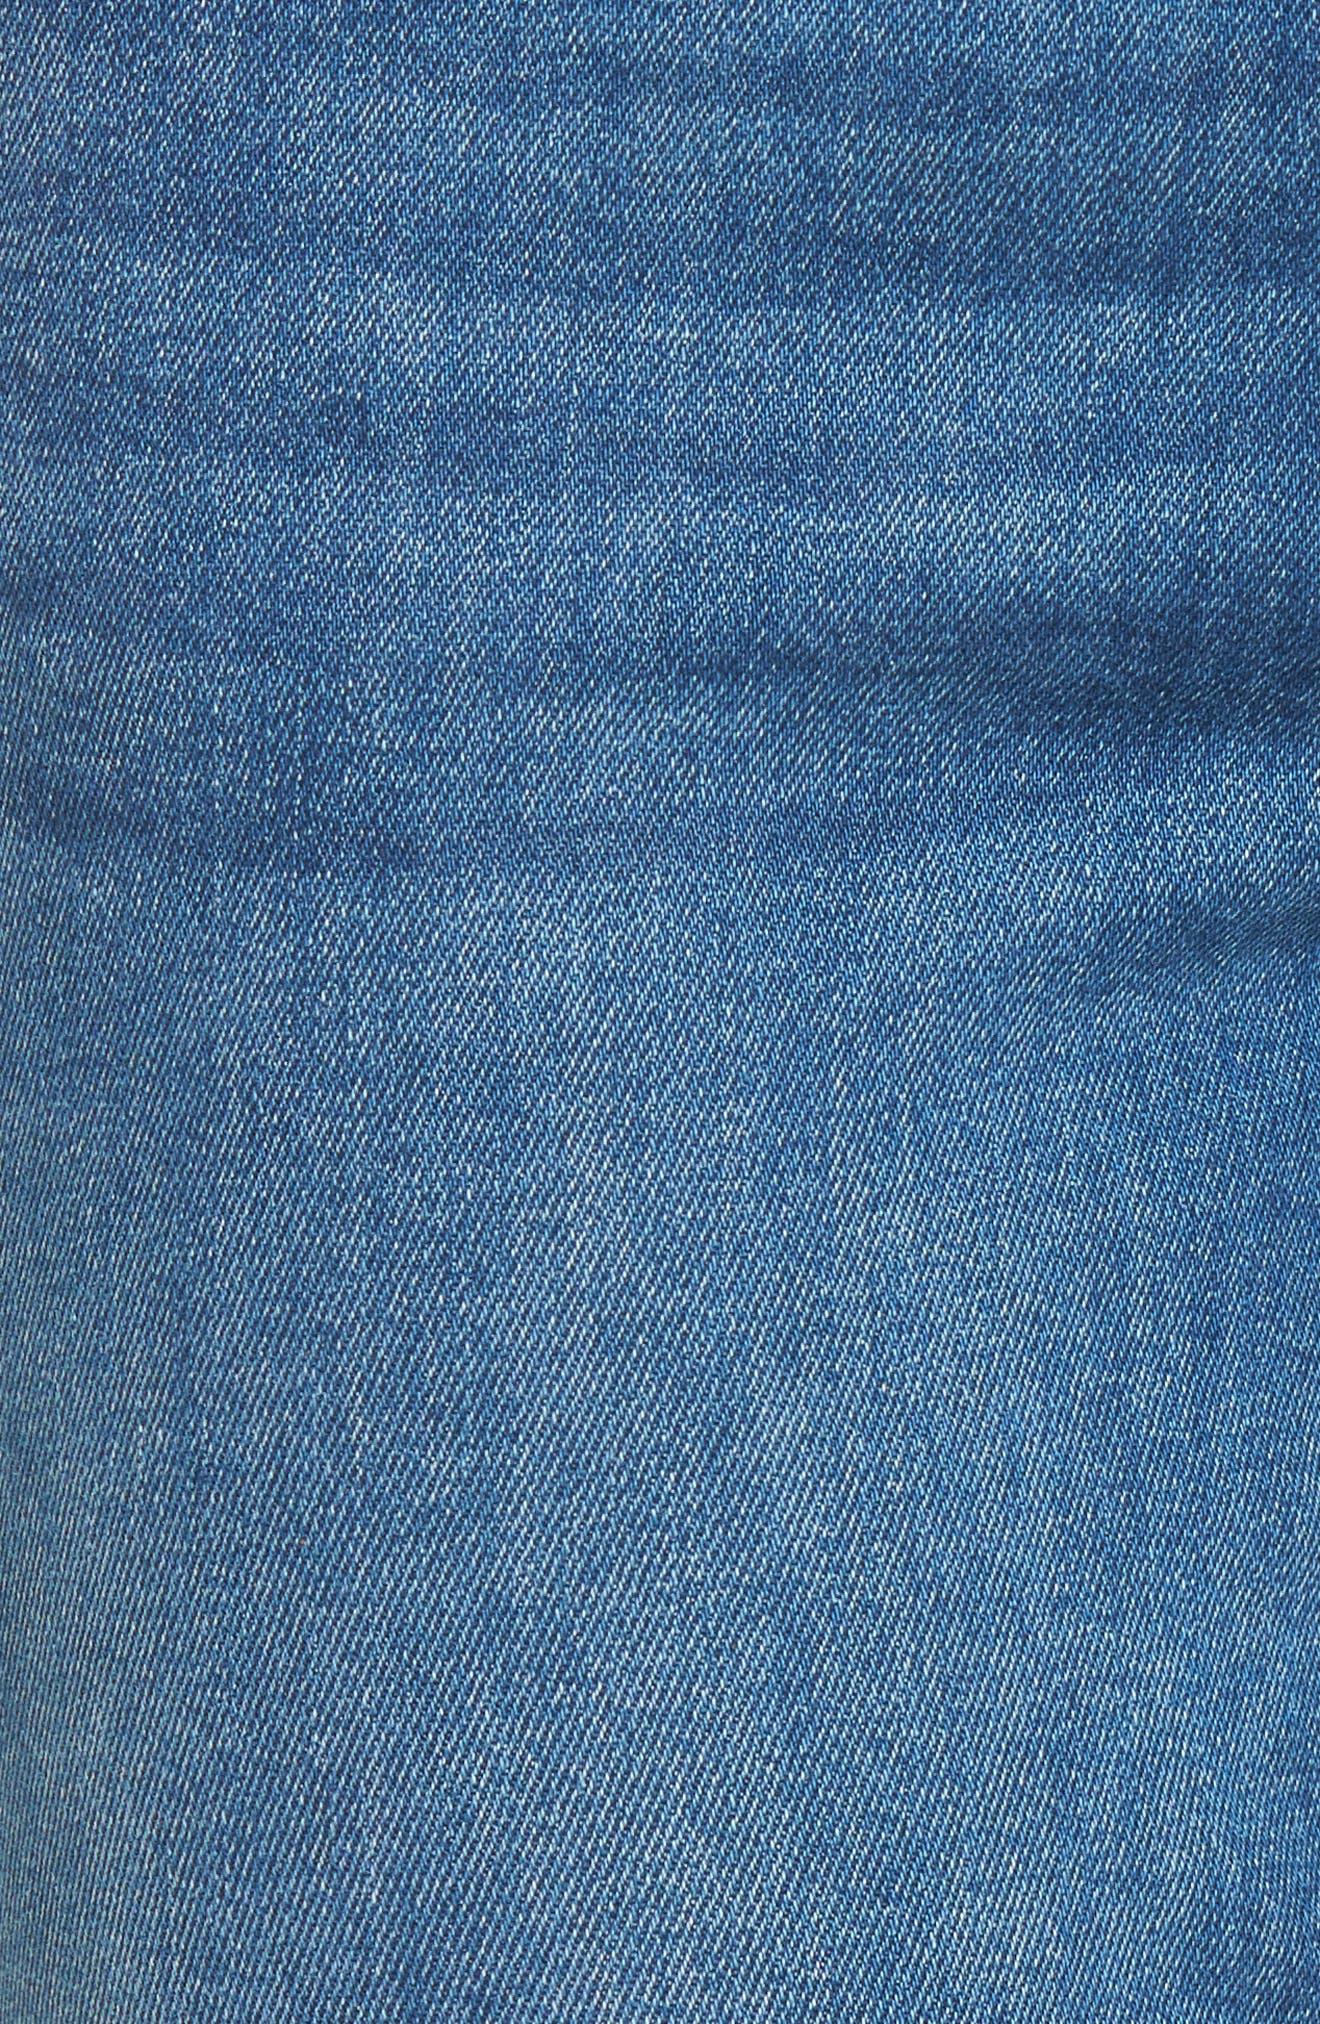 Jagger Skinny Jeans,                             Alternate thumbnail 5, color,                             426